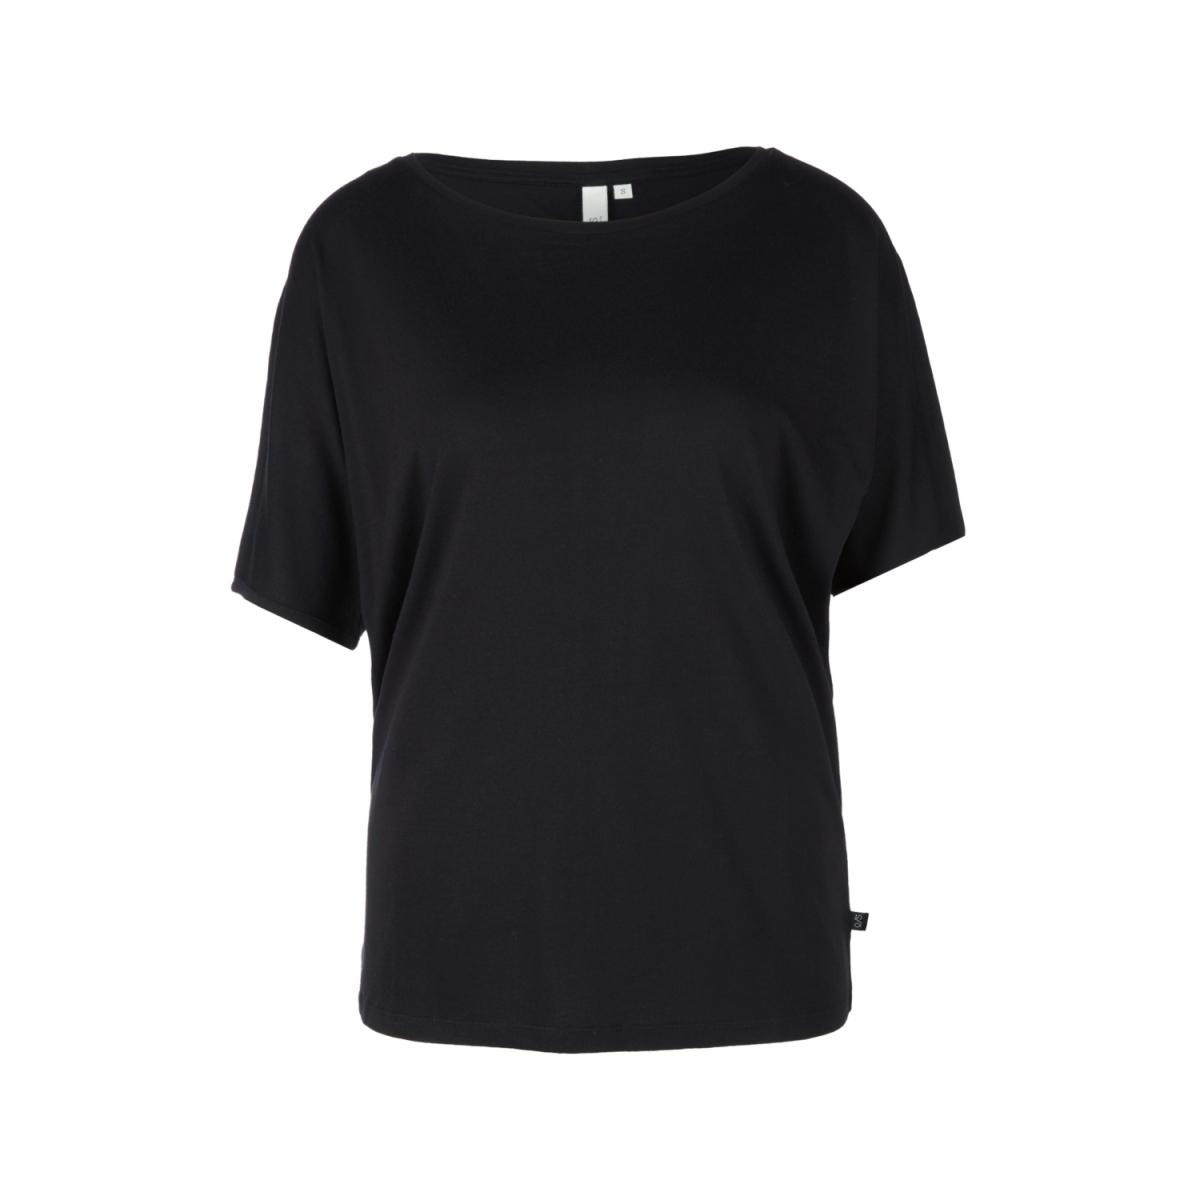 cold shoulder shirt 41907325508 q/s designed by t-shirt 9999